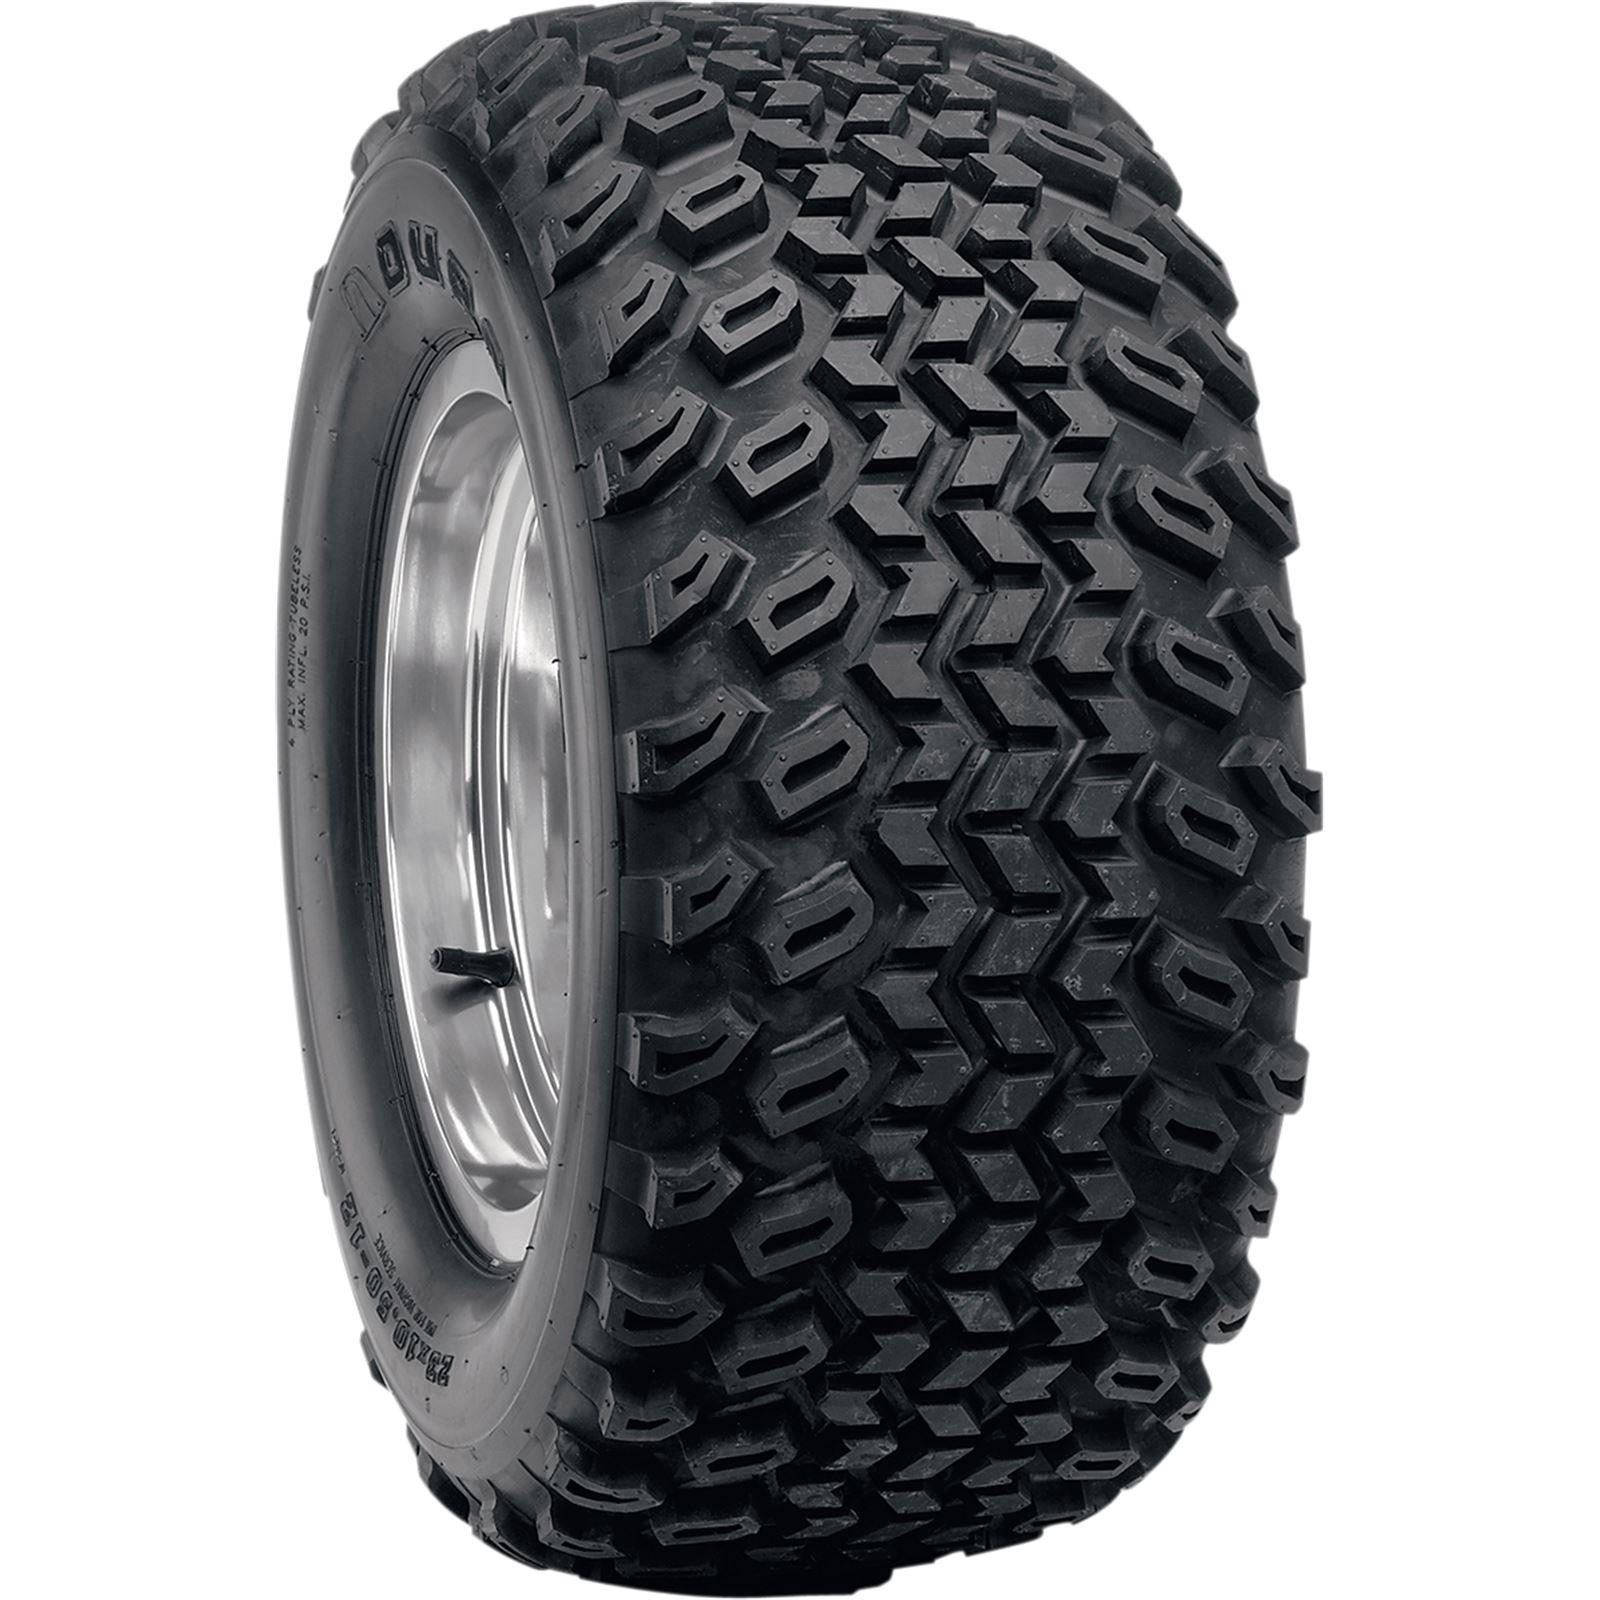 Duro Tire HF244 - 22X11-10 - 2 Ply